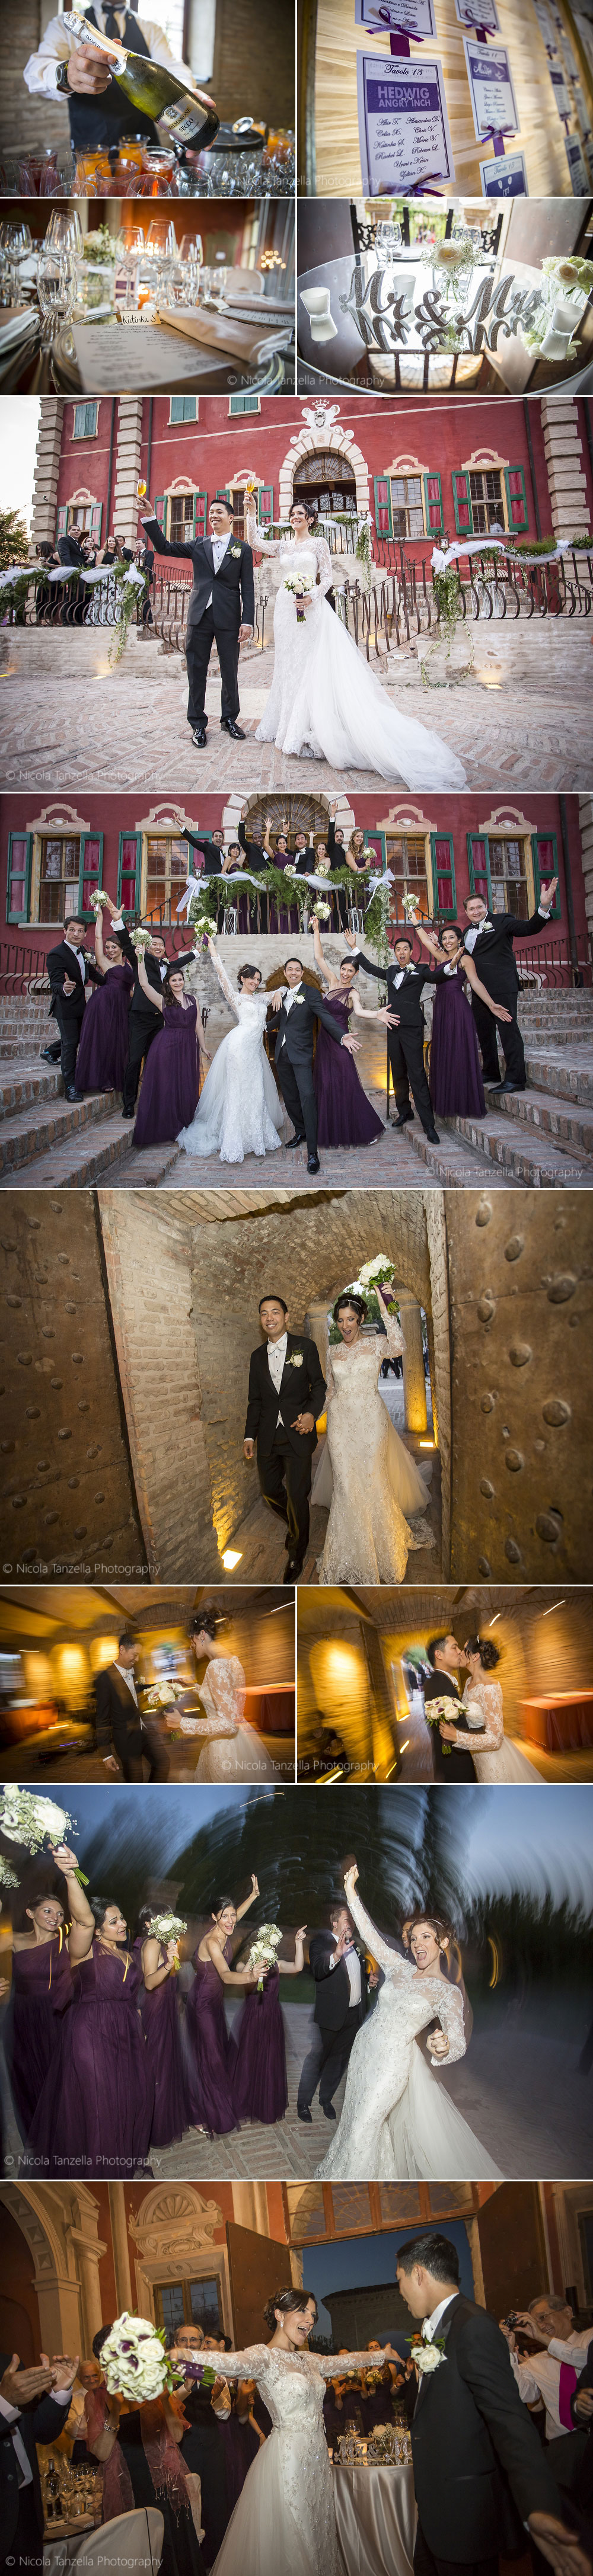 fotografo matrimonio modena -008